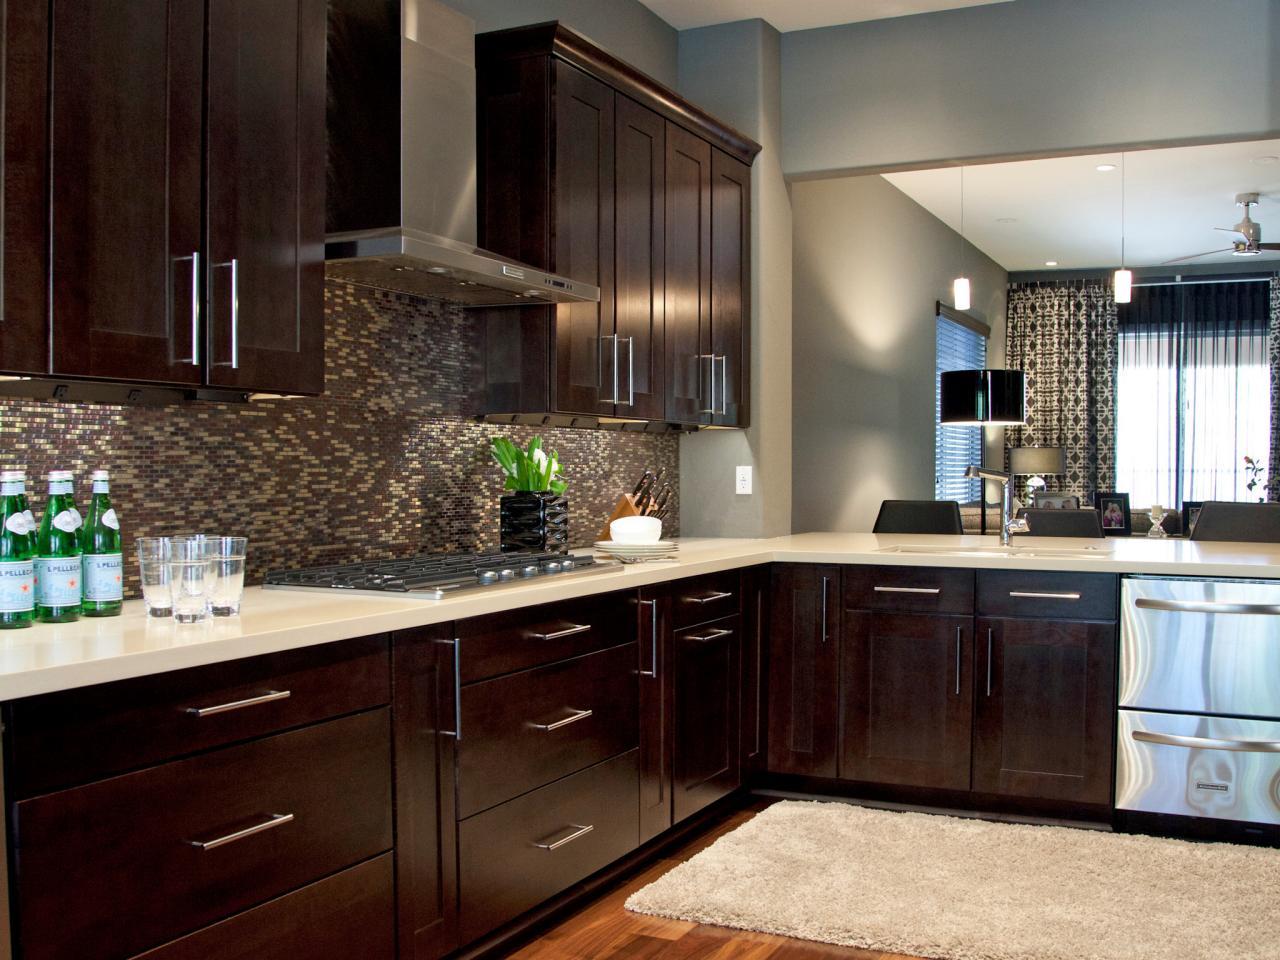 _Britany-Simon-Black-Gray-Contemporary-Kitchen_4x3.jpg.rend.hgtvcom.1280.960